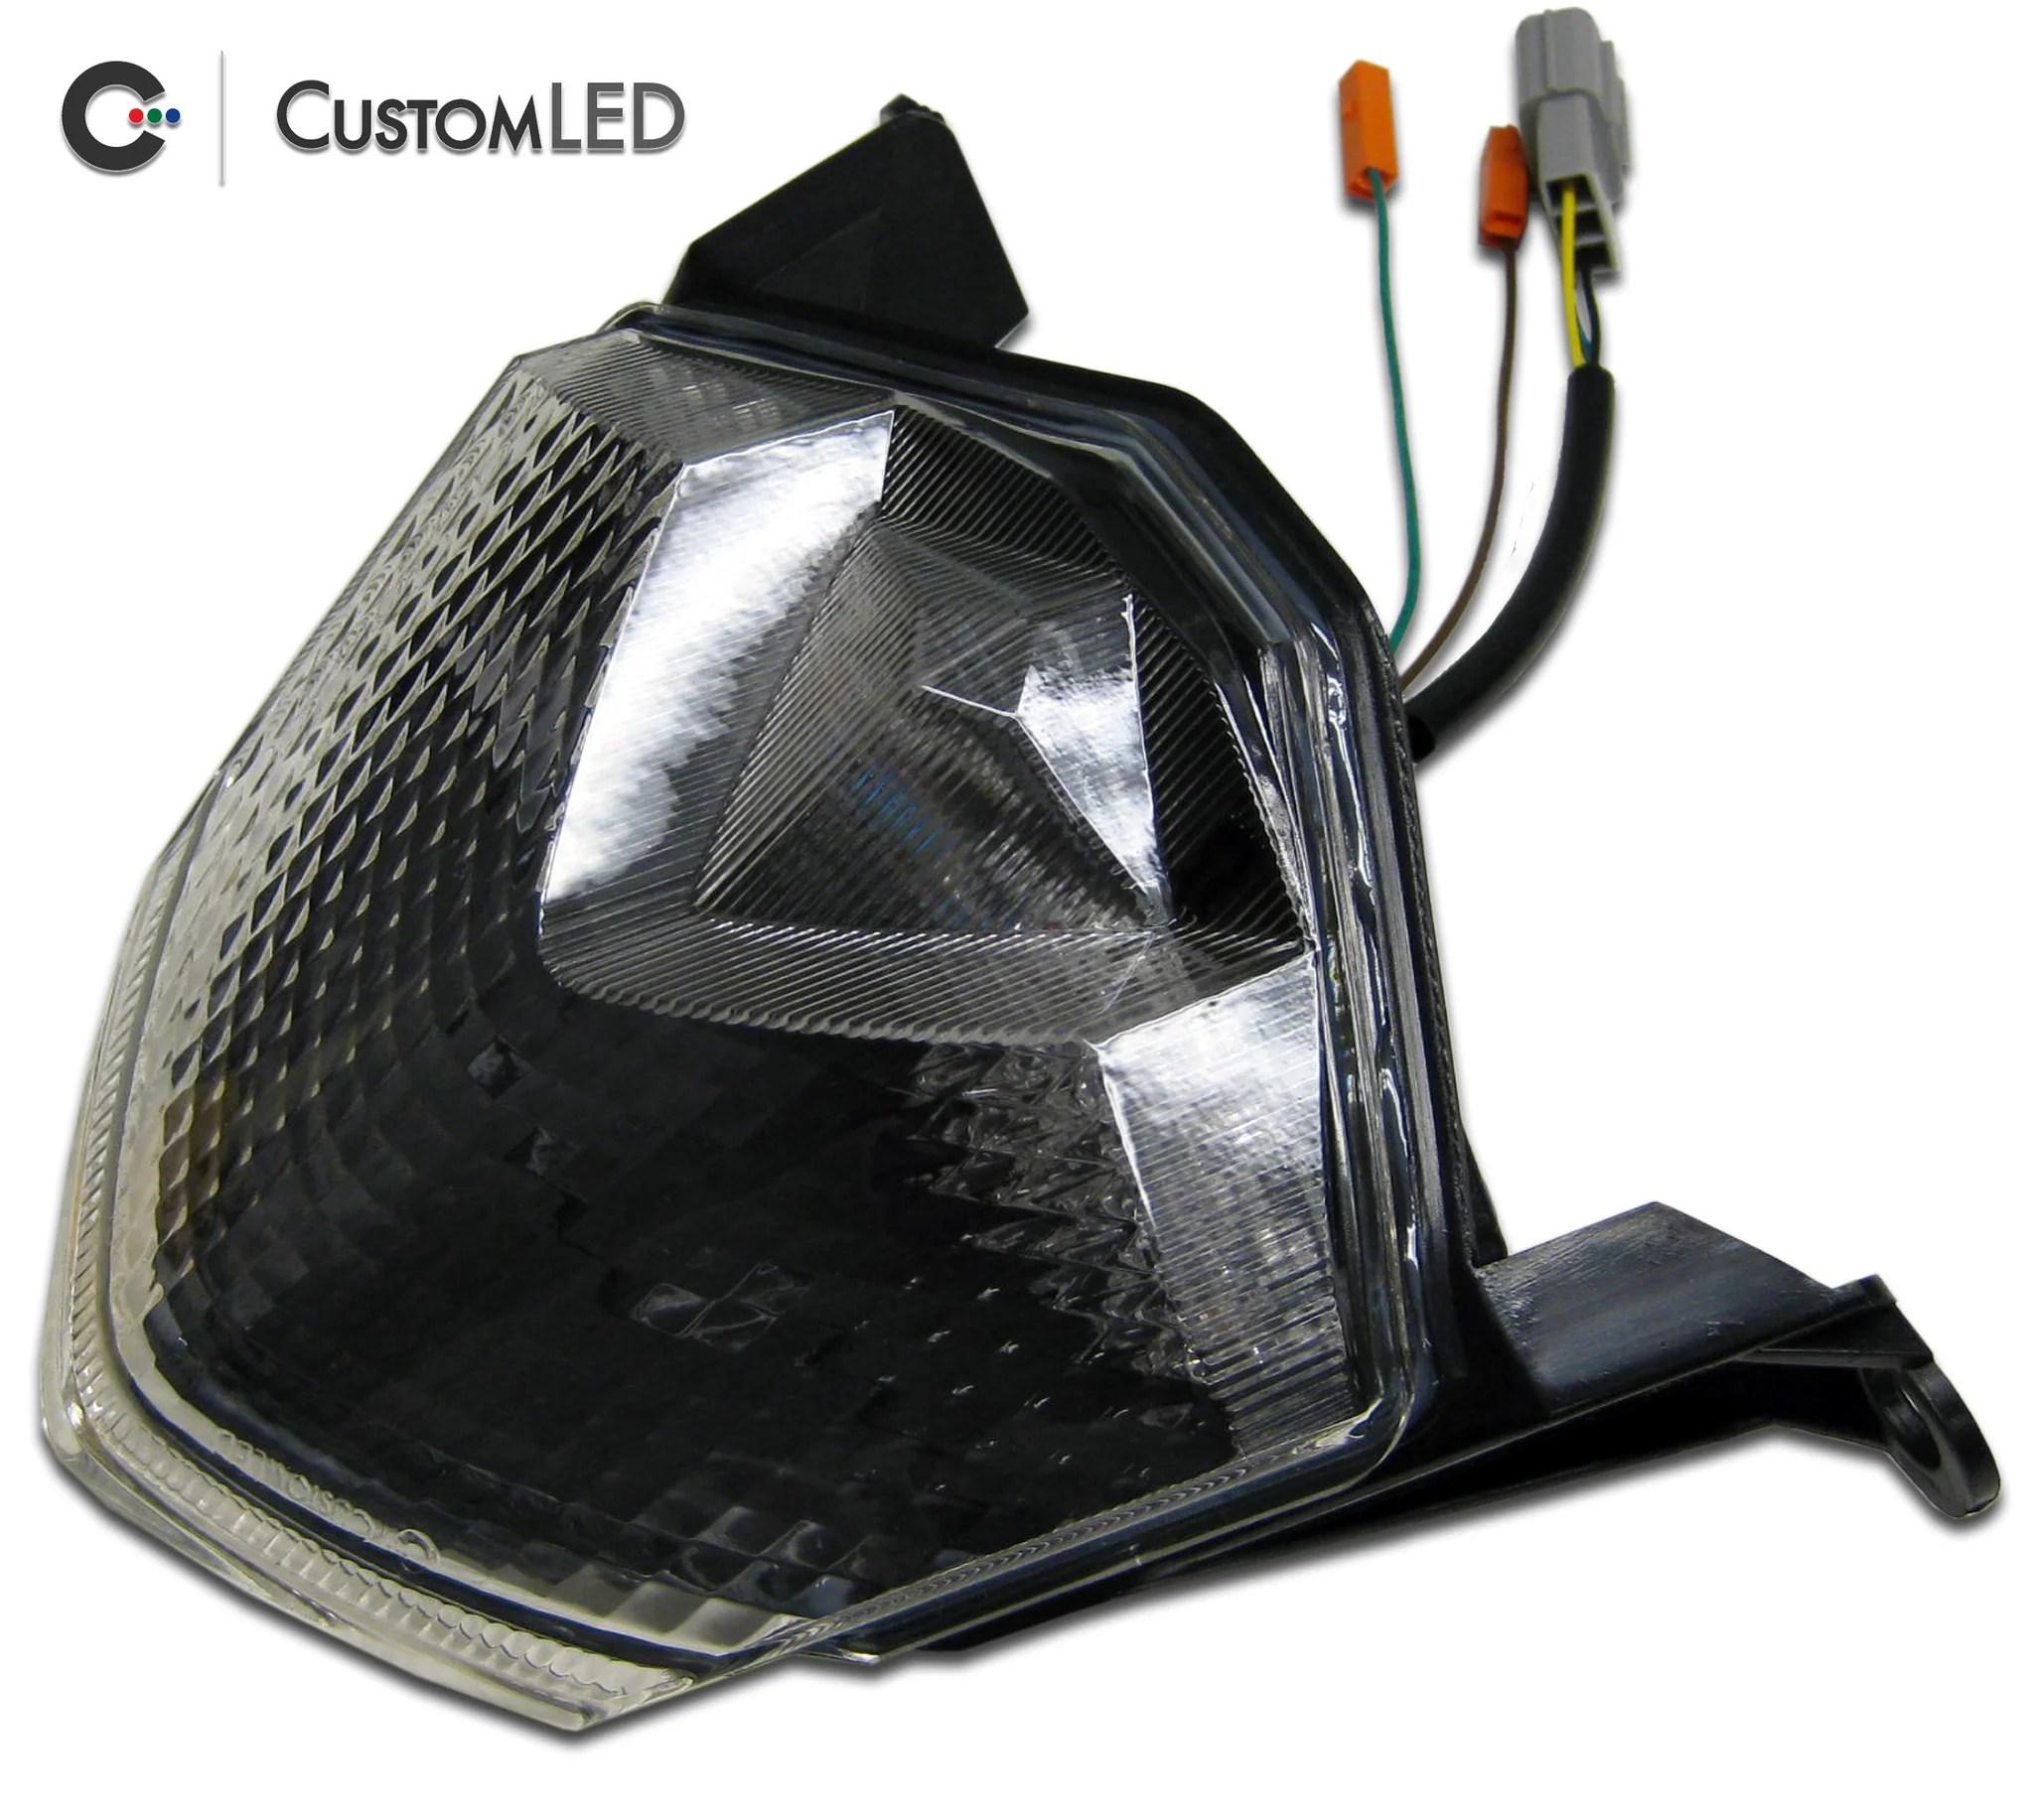 hight resolution of kawasaki ninja zx 10r blaster x integrated led tail light for years 2008 2009